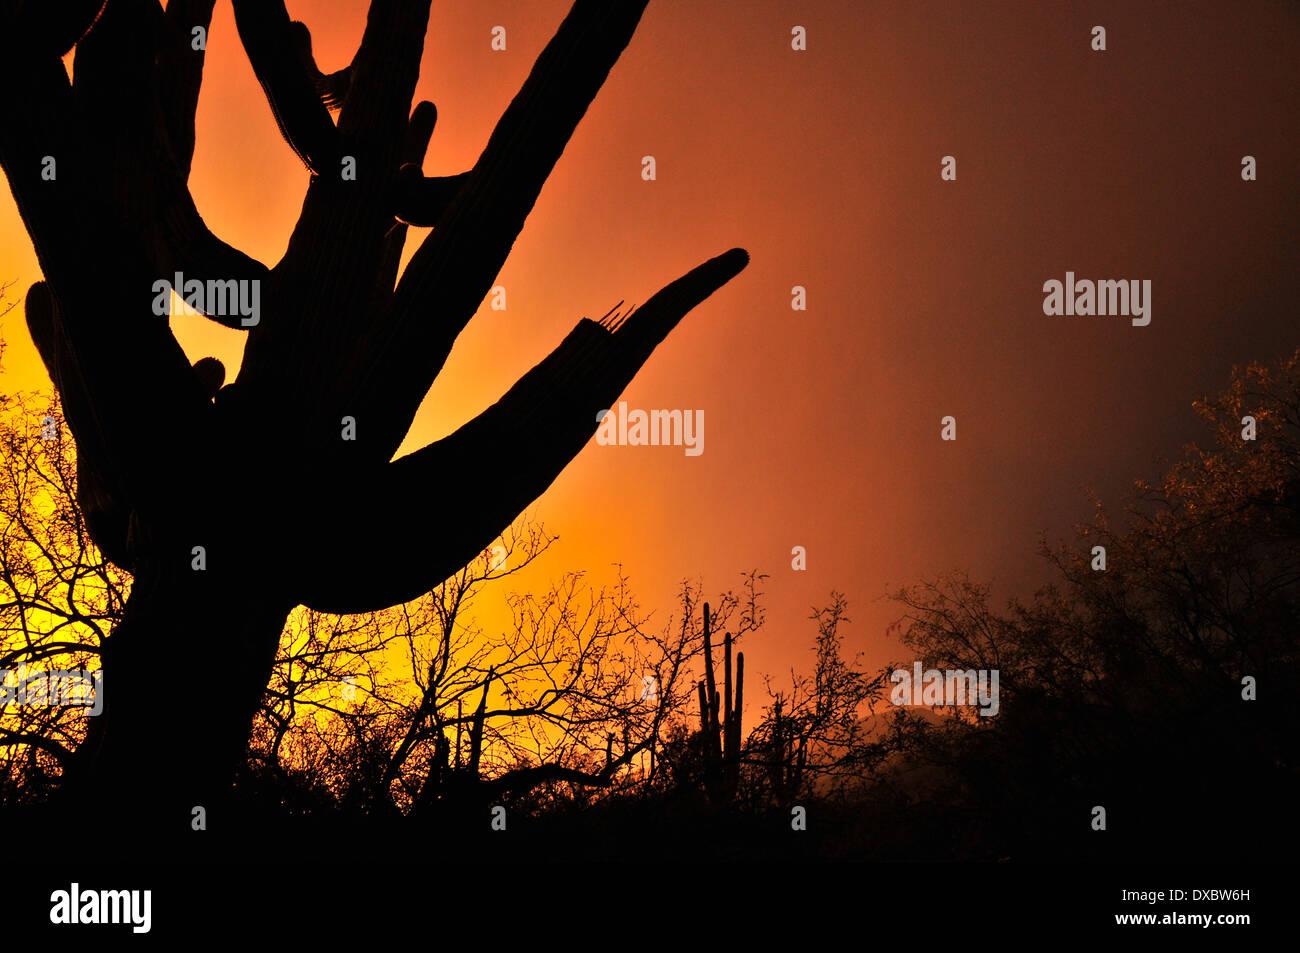 Saguaro cactus (Carnegiea gigantea) grow in the Sonoran Desert, Tucson, Arizona, USA. Stock Photo